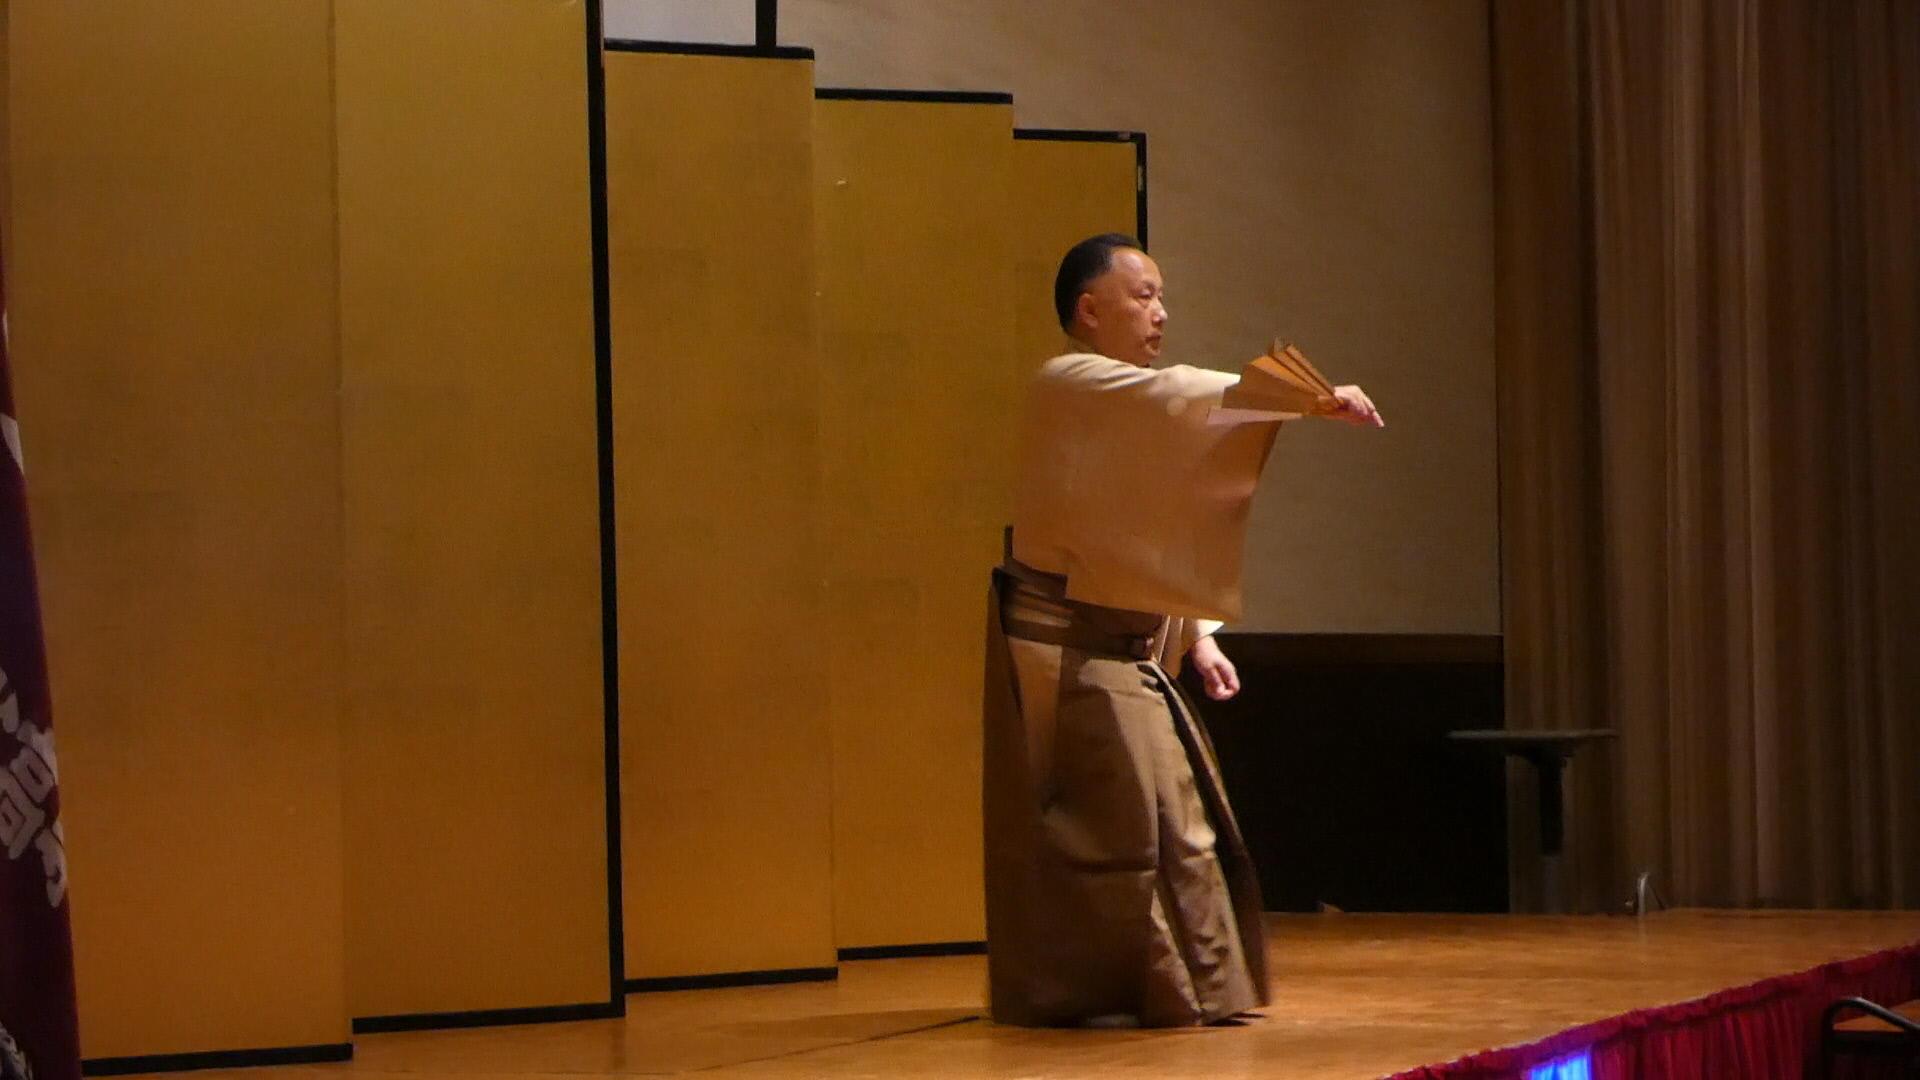 http://www.kyoto-be.ne.jp/suzaku-hs/mt/dousoukai/images/2019-06-30_111426%281%29.jpg